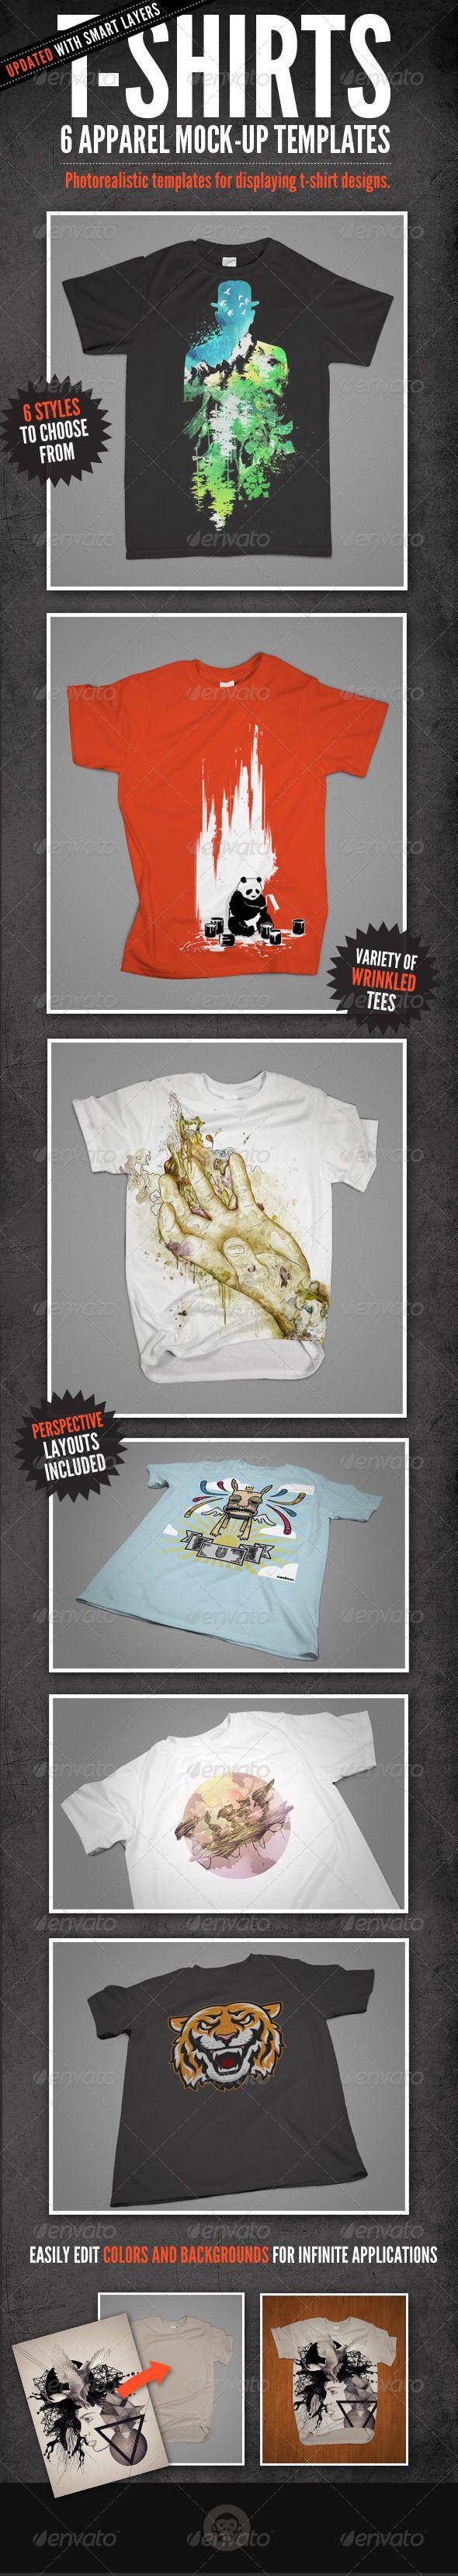 Design t shirt photoshop cs5 - T Shirt Mock Ups Apparel Design